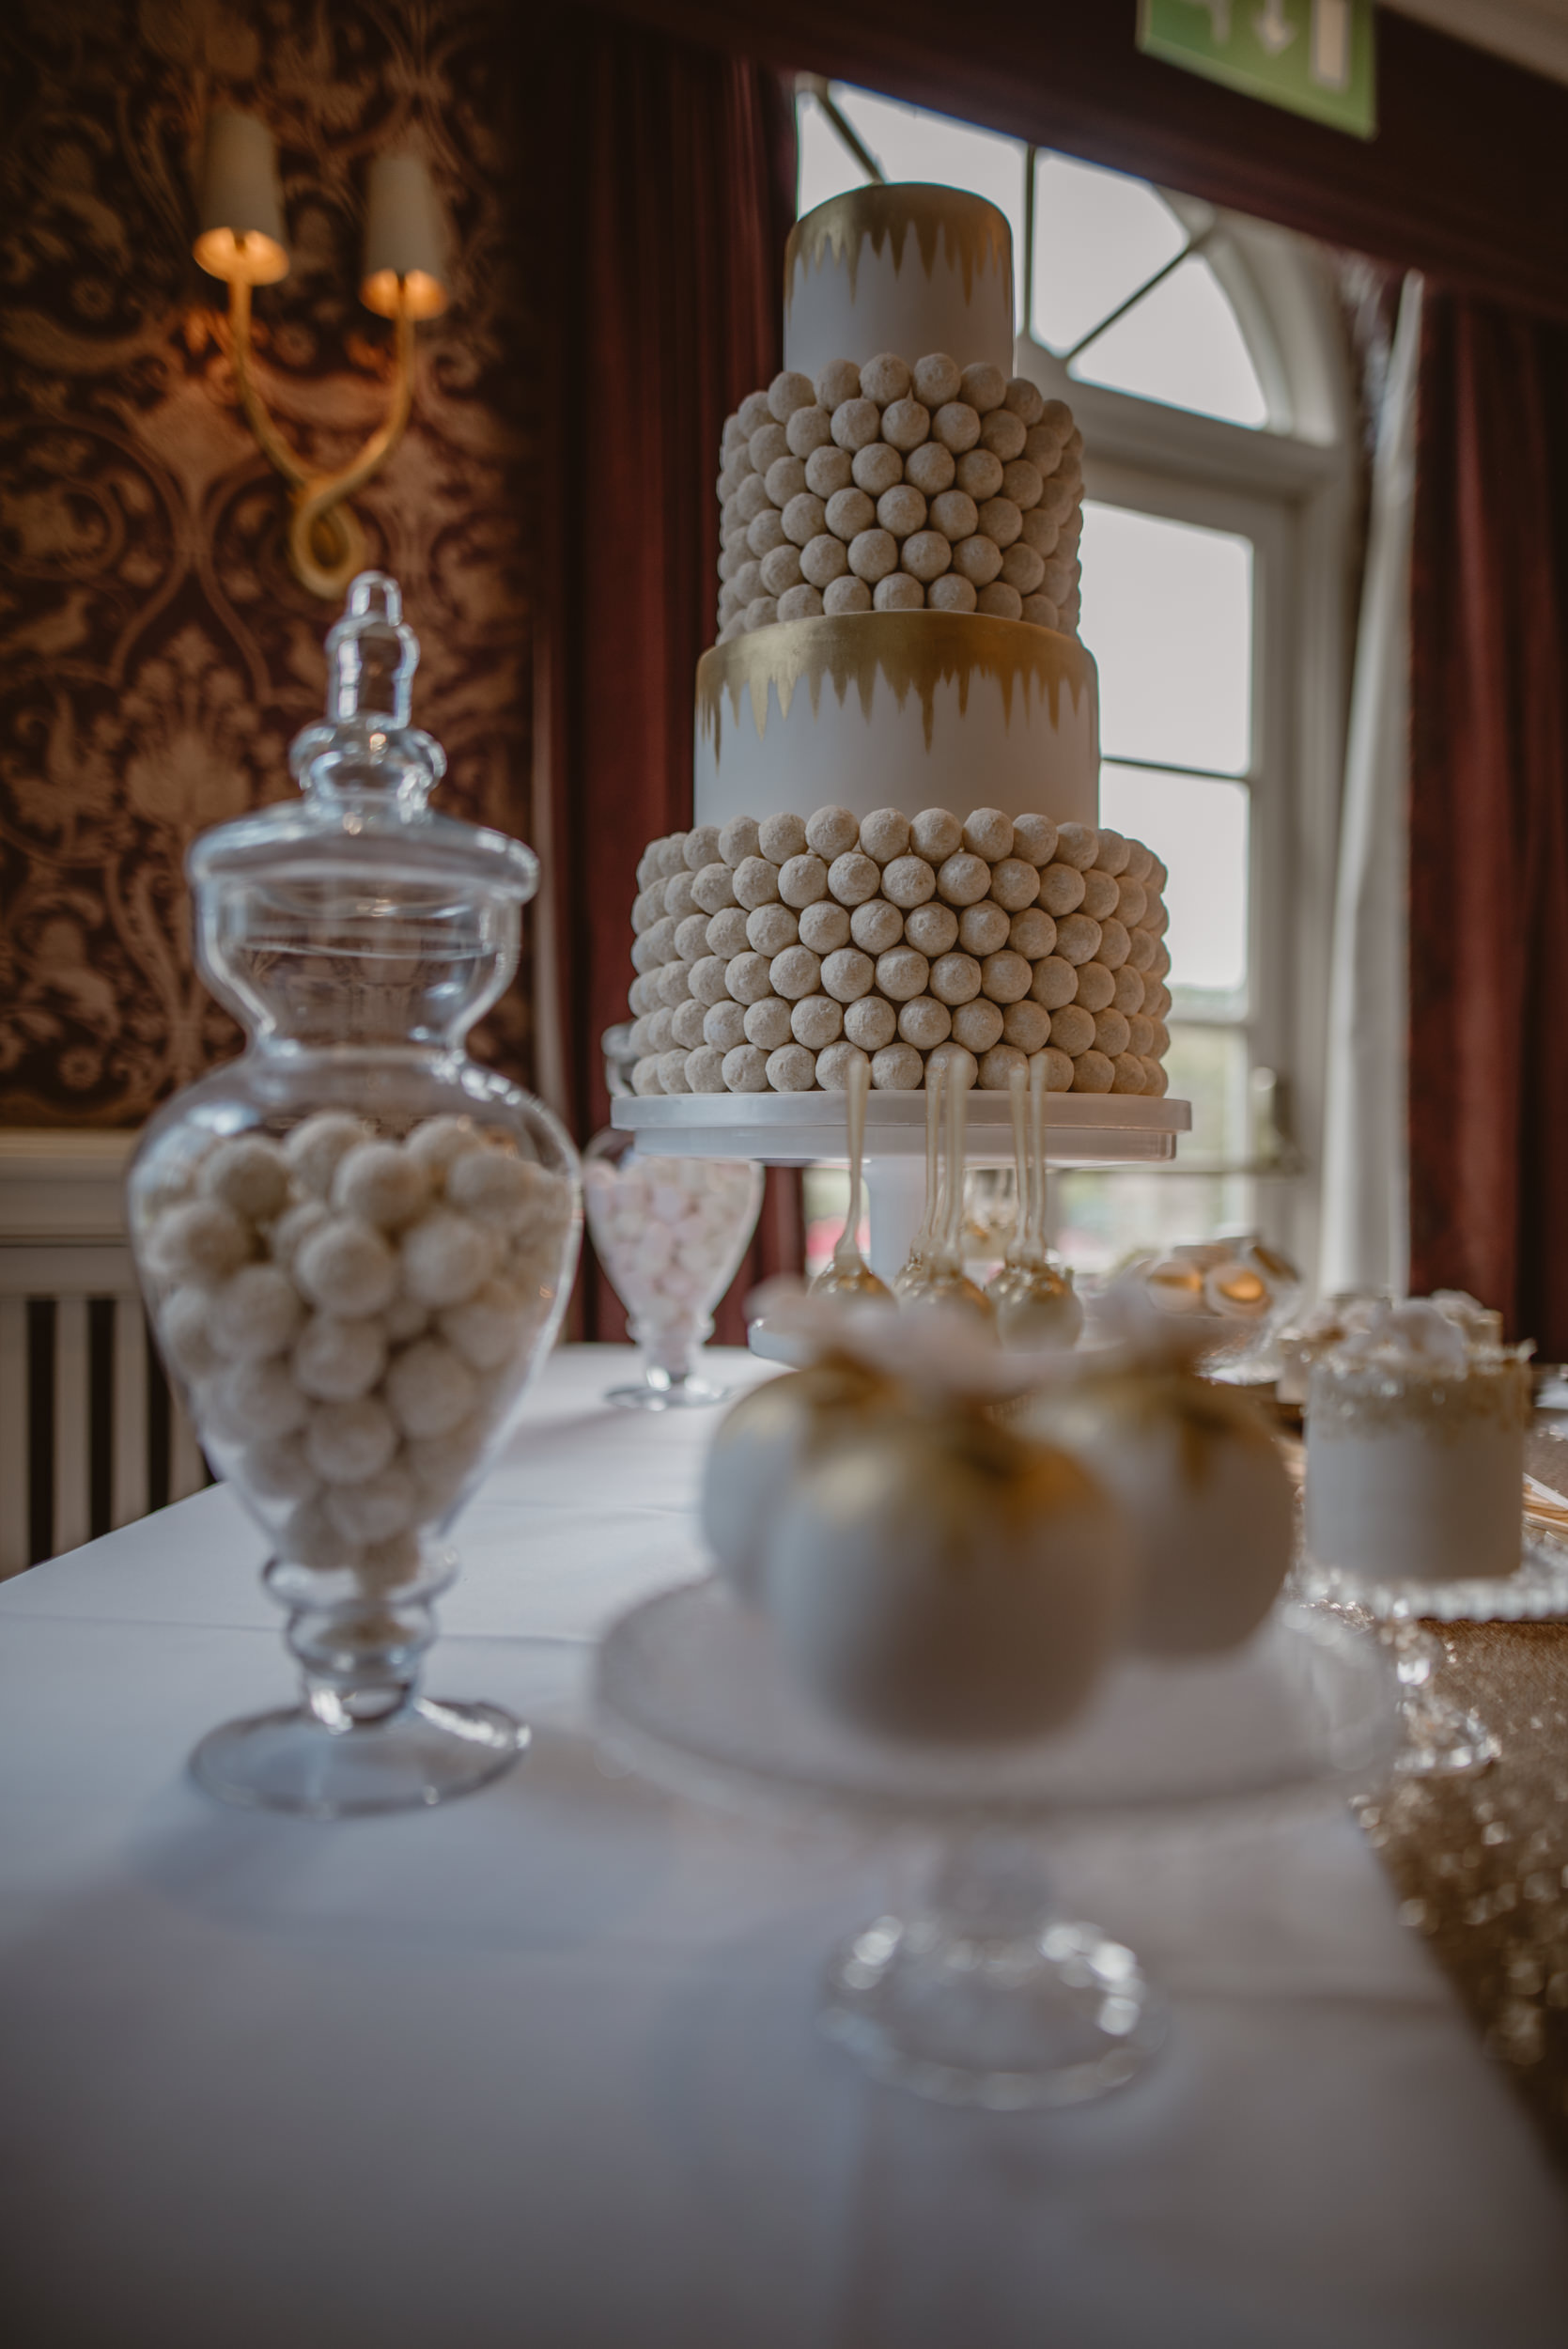 Trisha-and-Roger-wedding-The-Priory-Church-and-Chewton-Glen-Hotel-Christchurch-Manu-Mendoza-Wedding-Photography-256.jpg